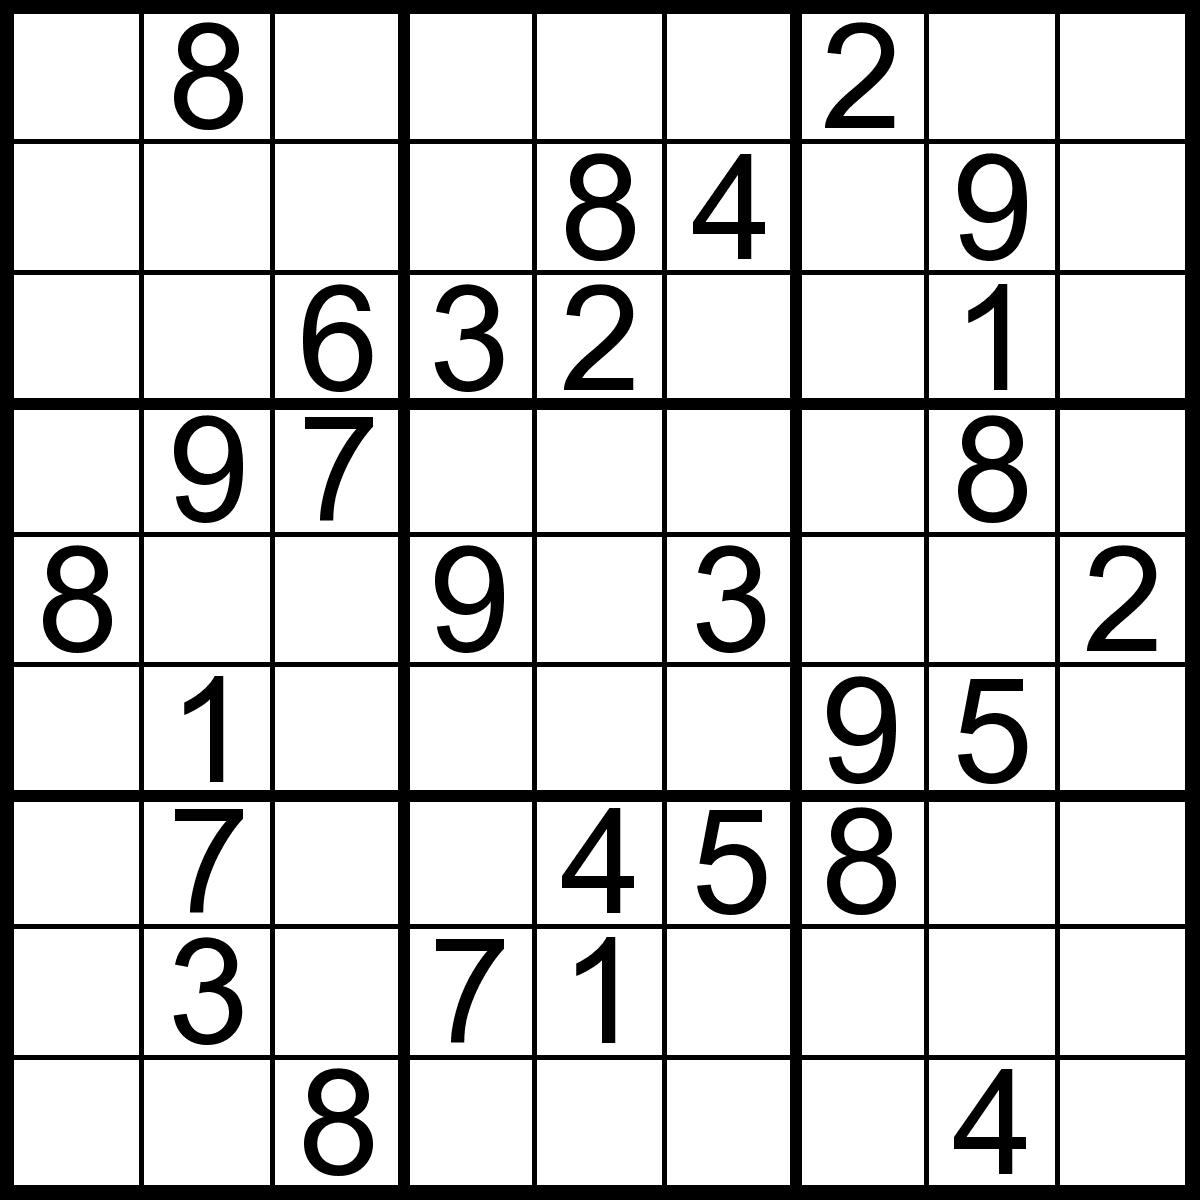 How To Solve Easy Sudoku Puzzles | Riyadmahmud111